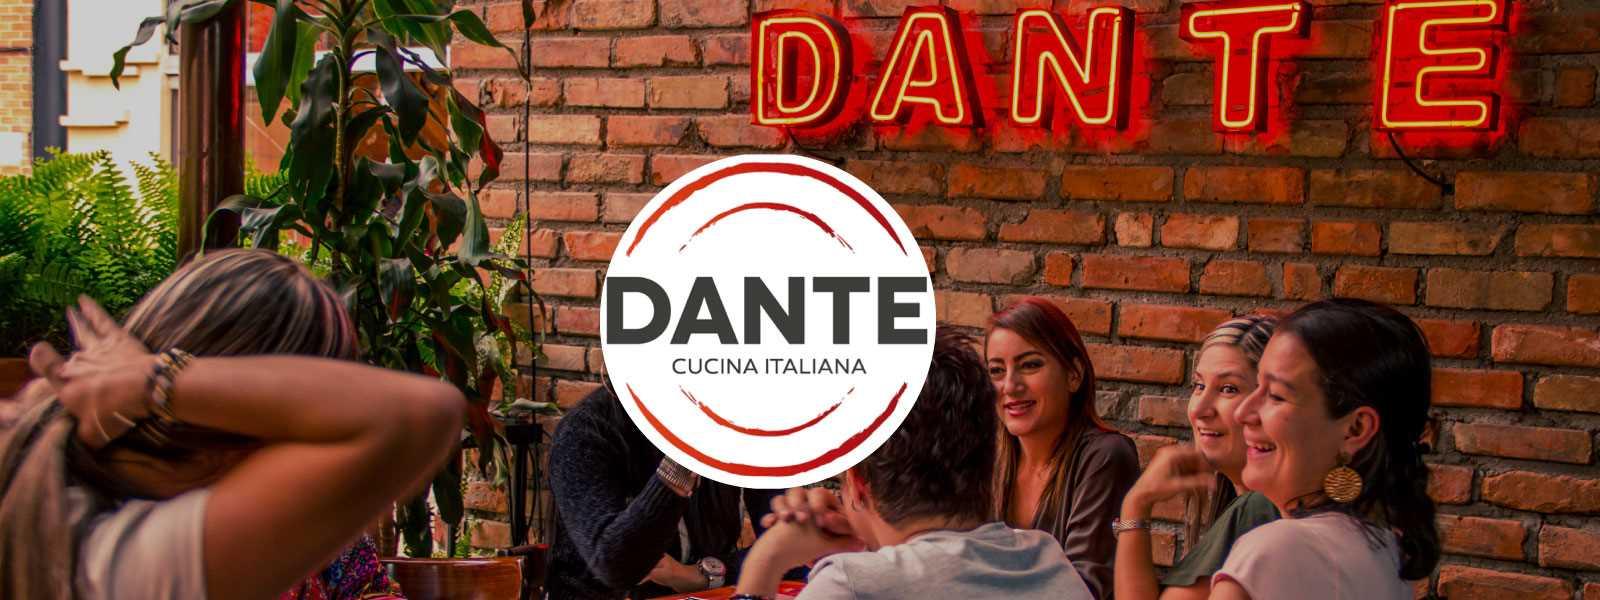 DANTE-La-Strada